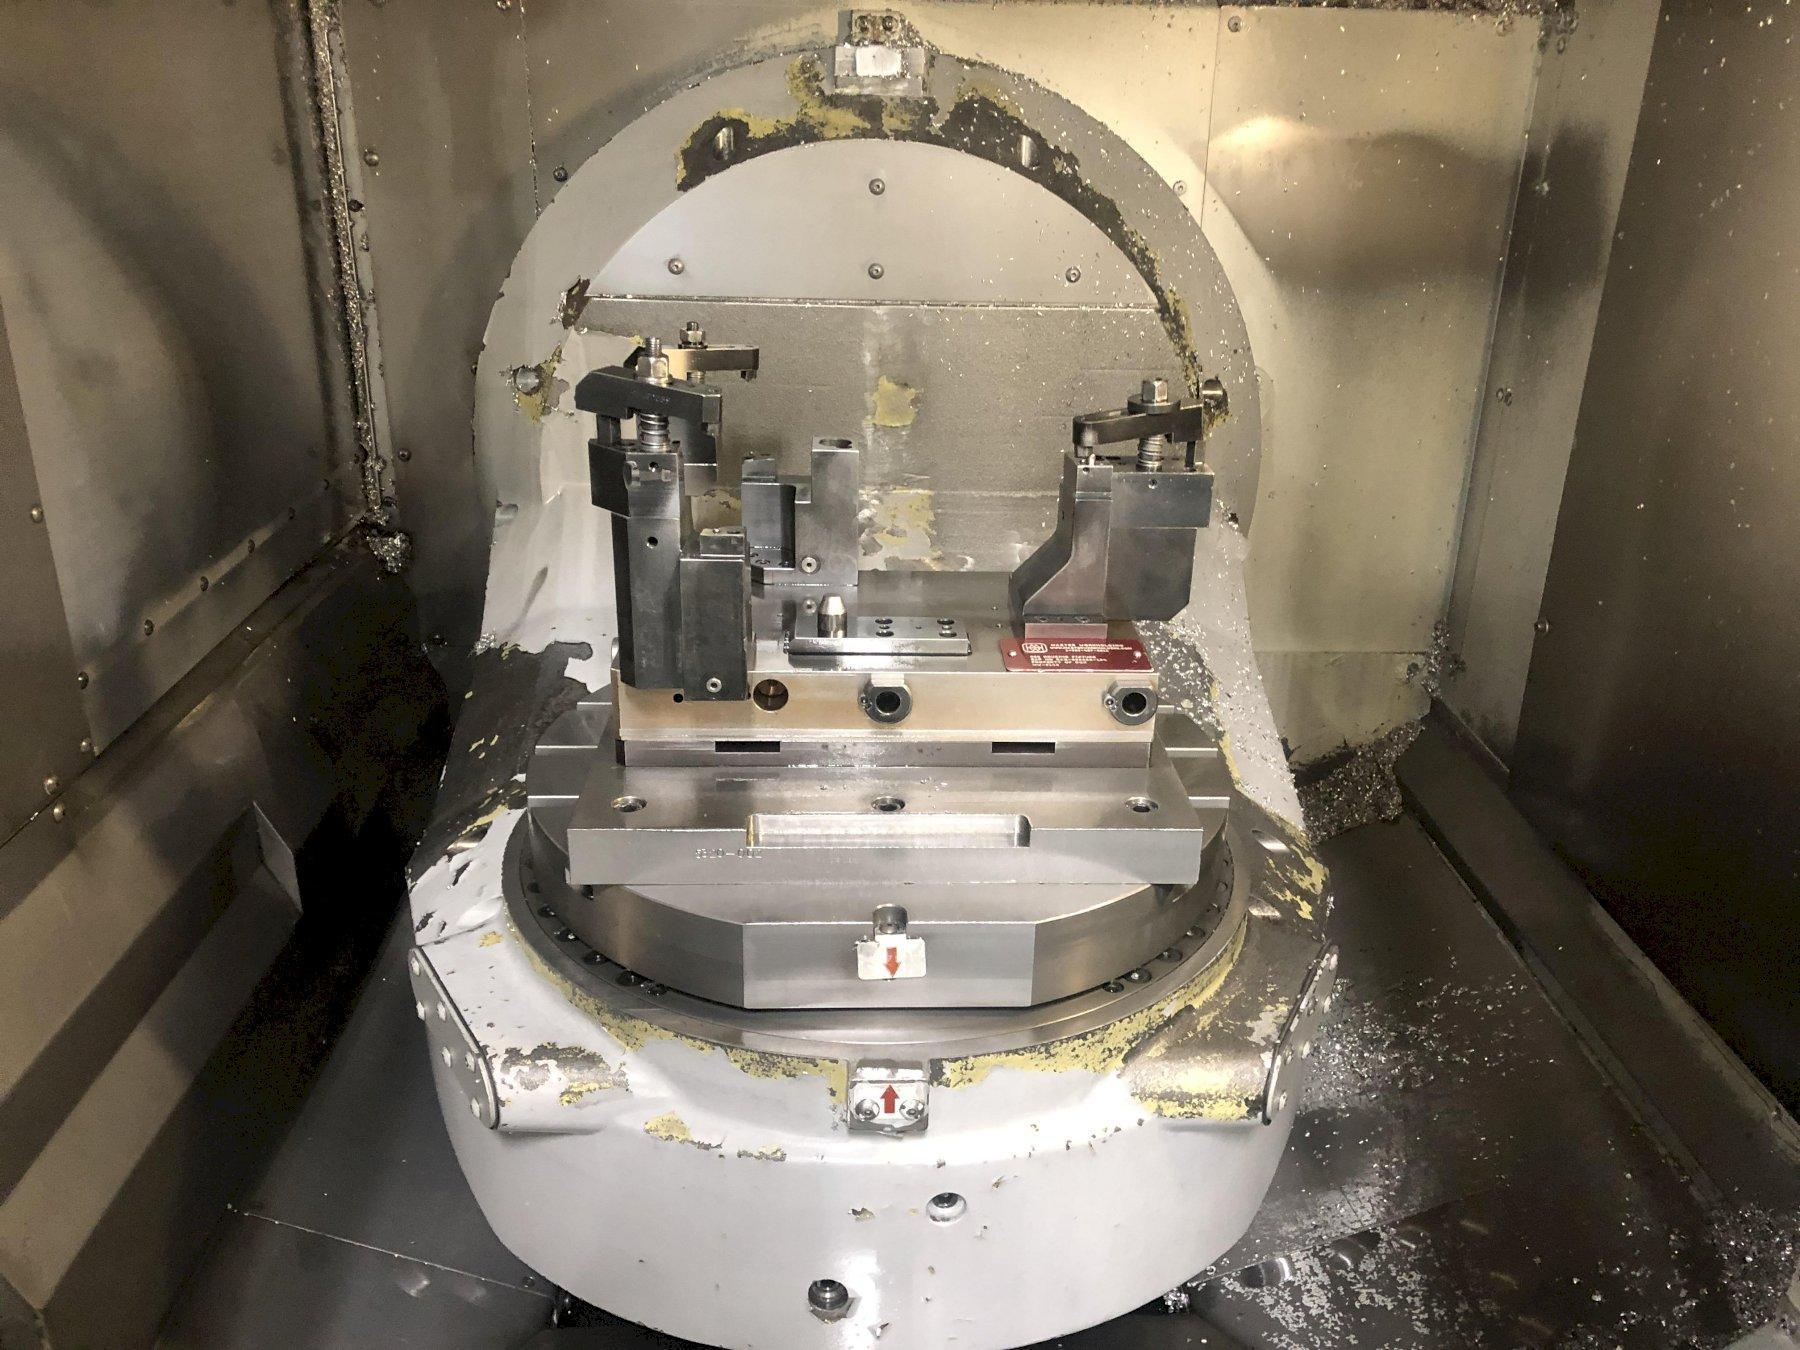 Mori Seiki NMV5000 DCG Vertical Machining Center